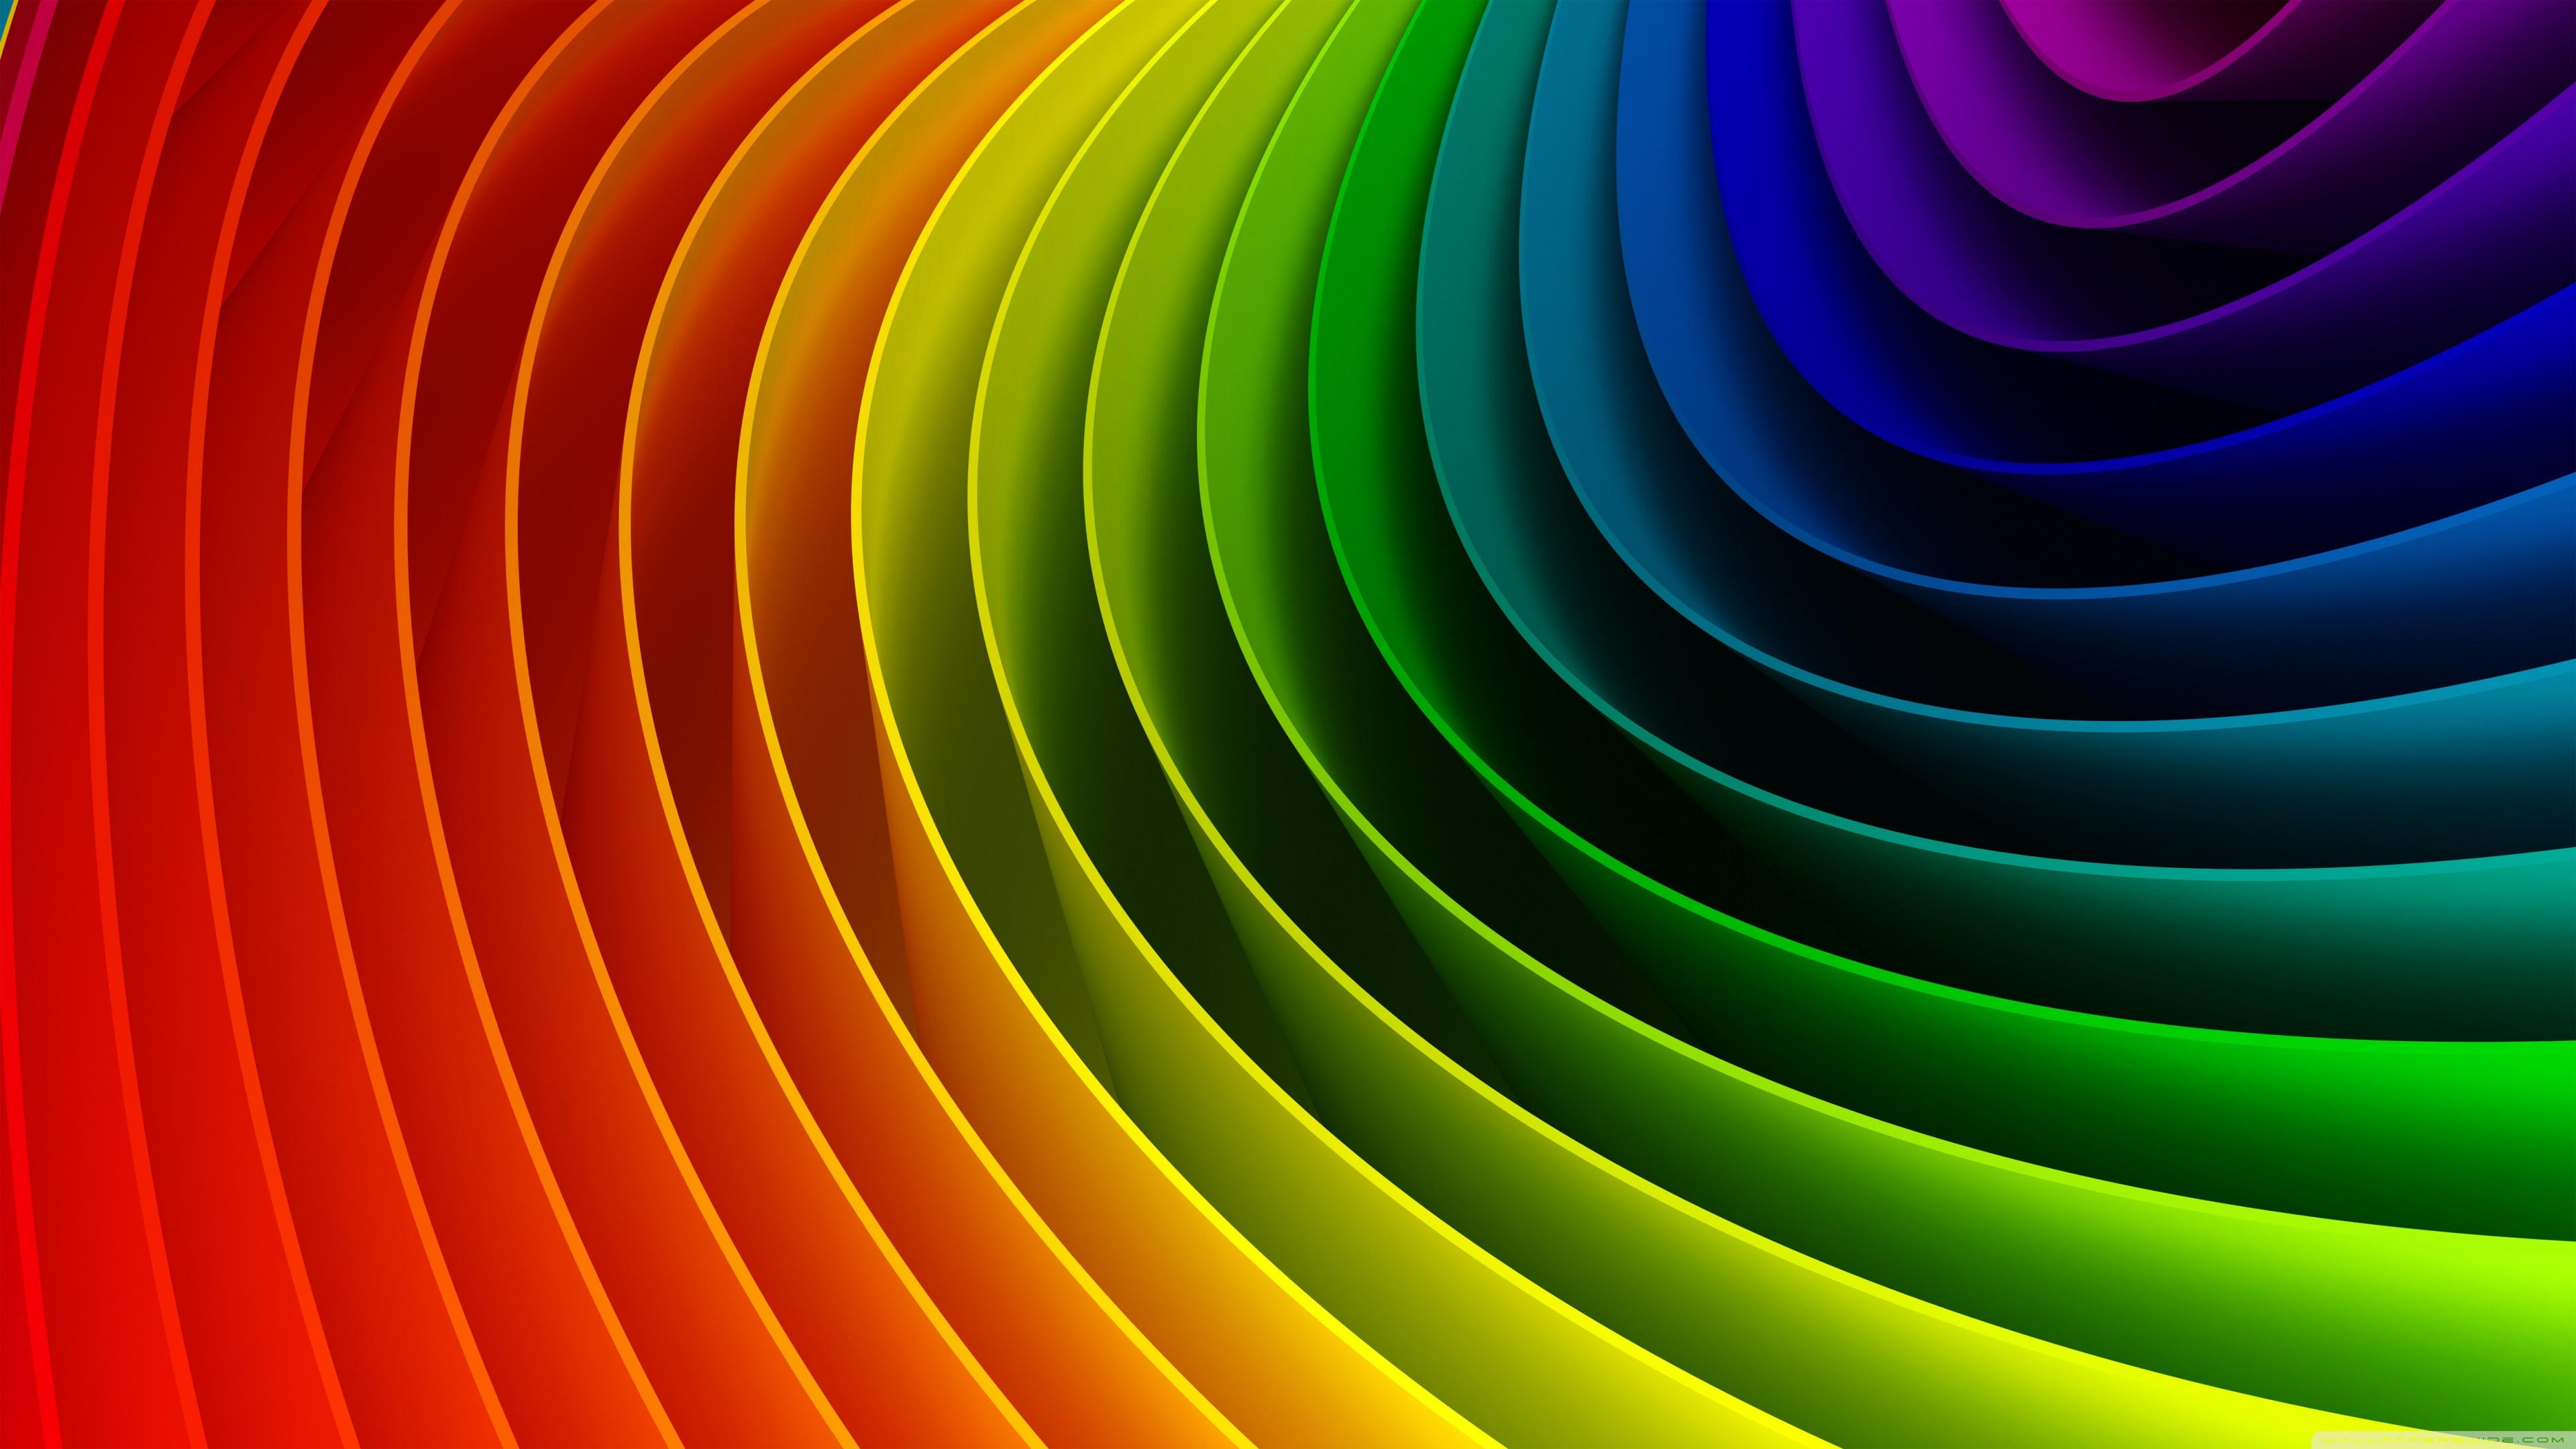 Rainbow Art 3D 4K HD Desktop Wallpaper For Ultra TV O Wide